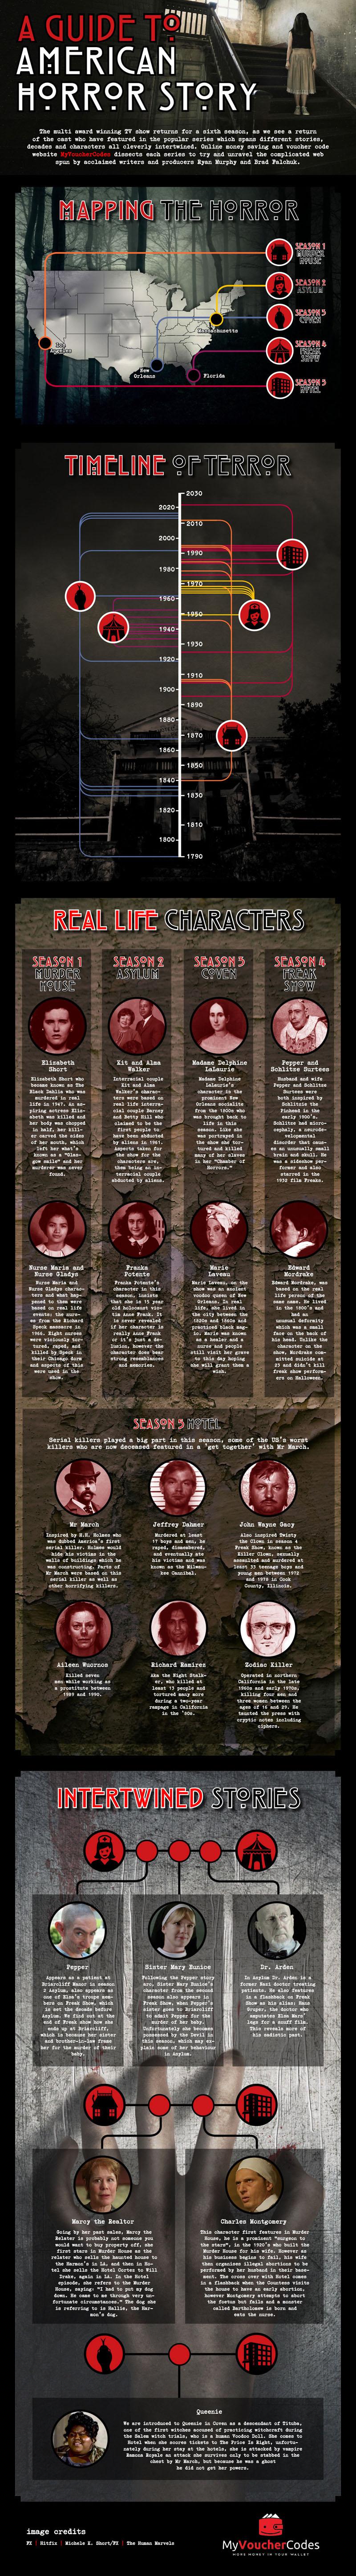 History-of-AHS.jpg